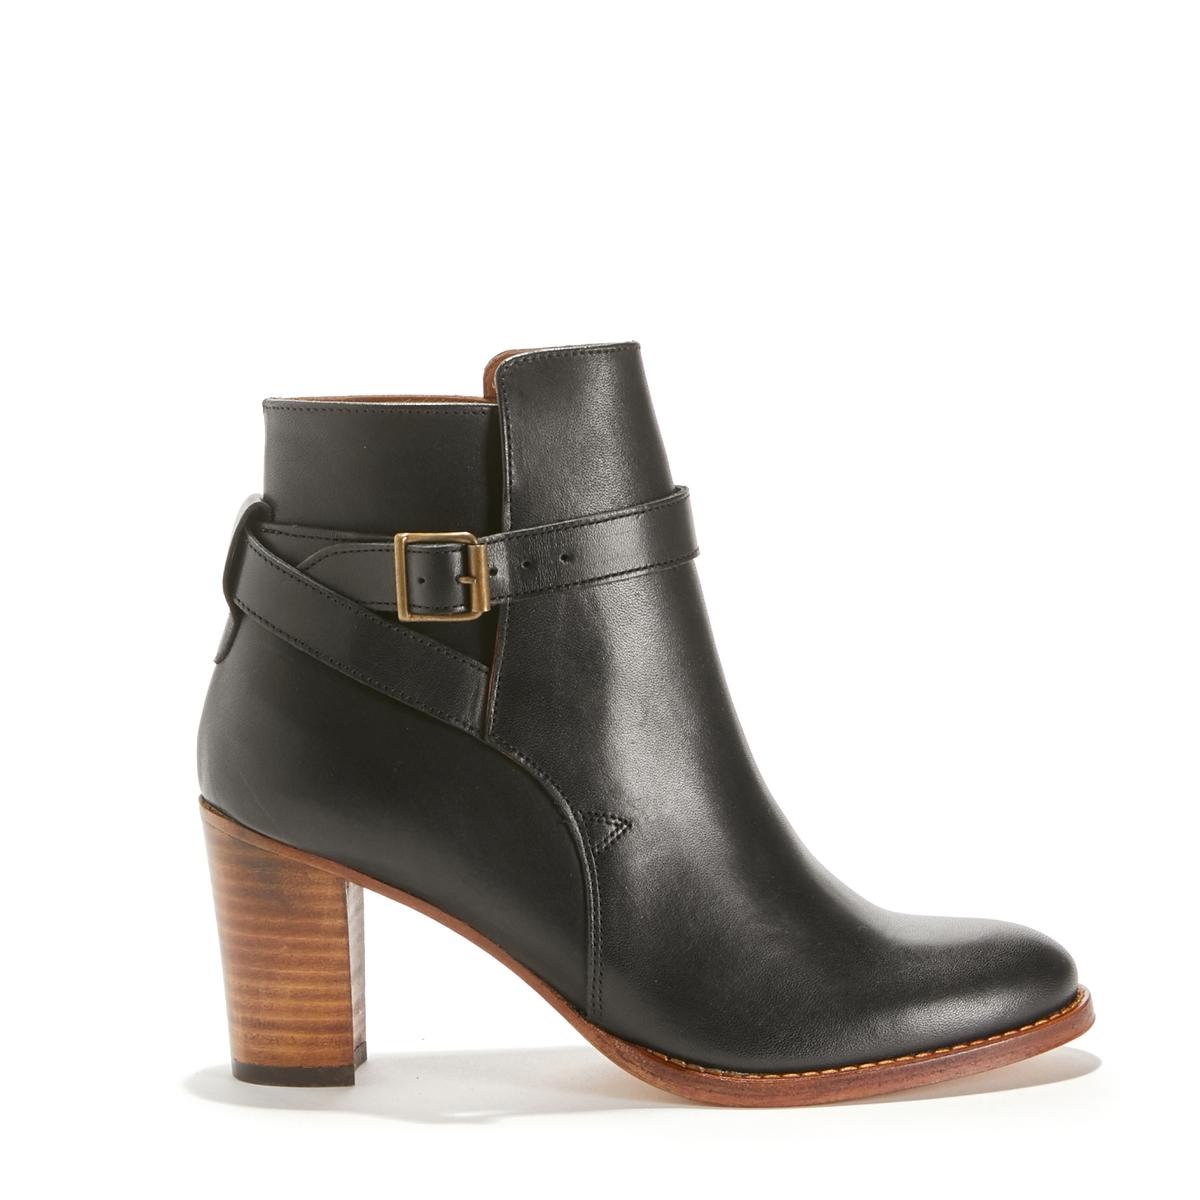 Ботильоны кожаные на каблуке CAPUCINE цены онлайн